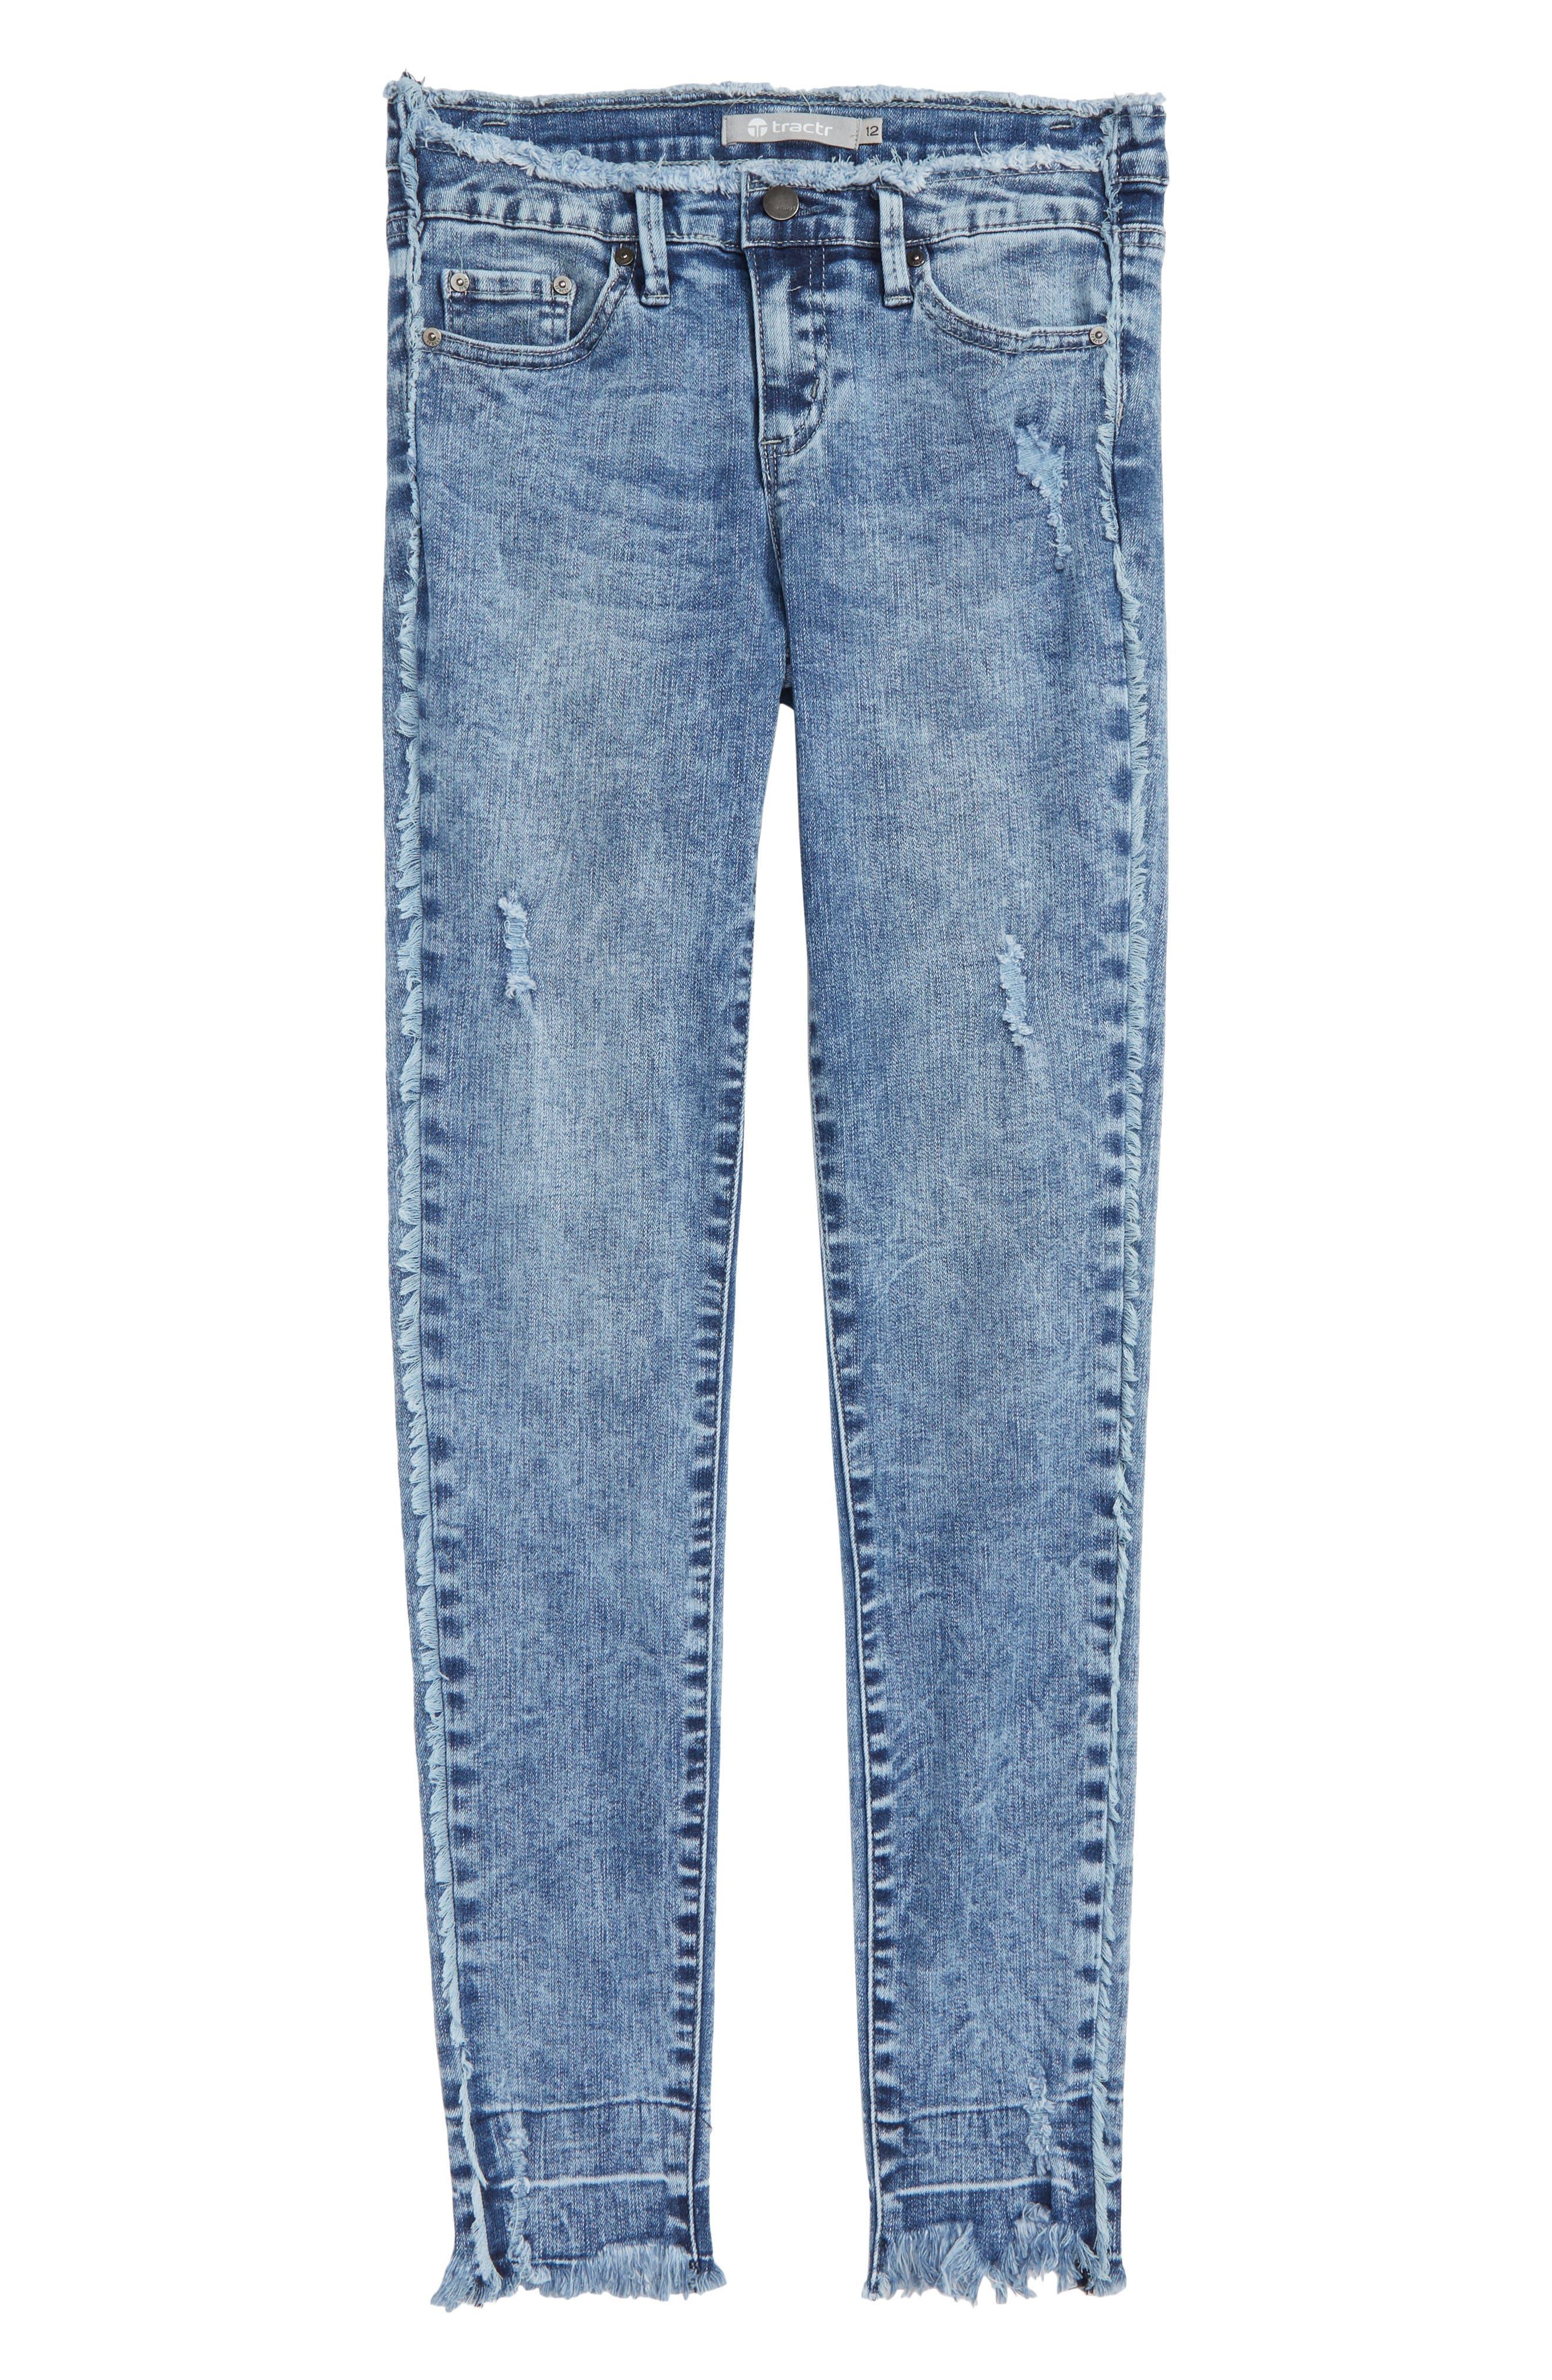 High Waist Frayed Skinny Jeans,                             Main thumbnail 1, color,                             407